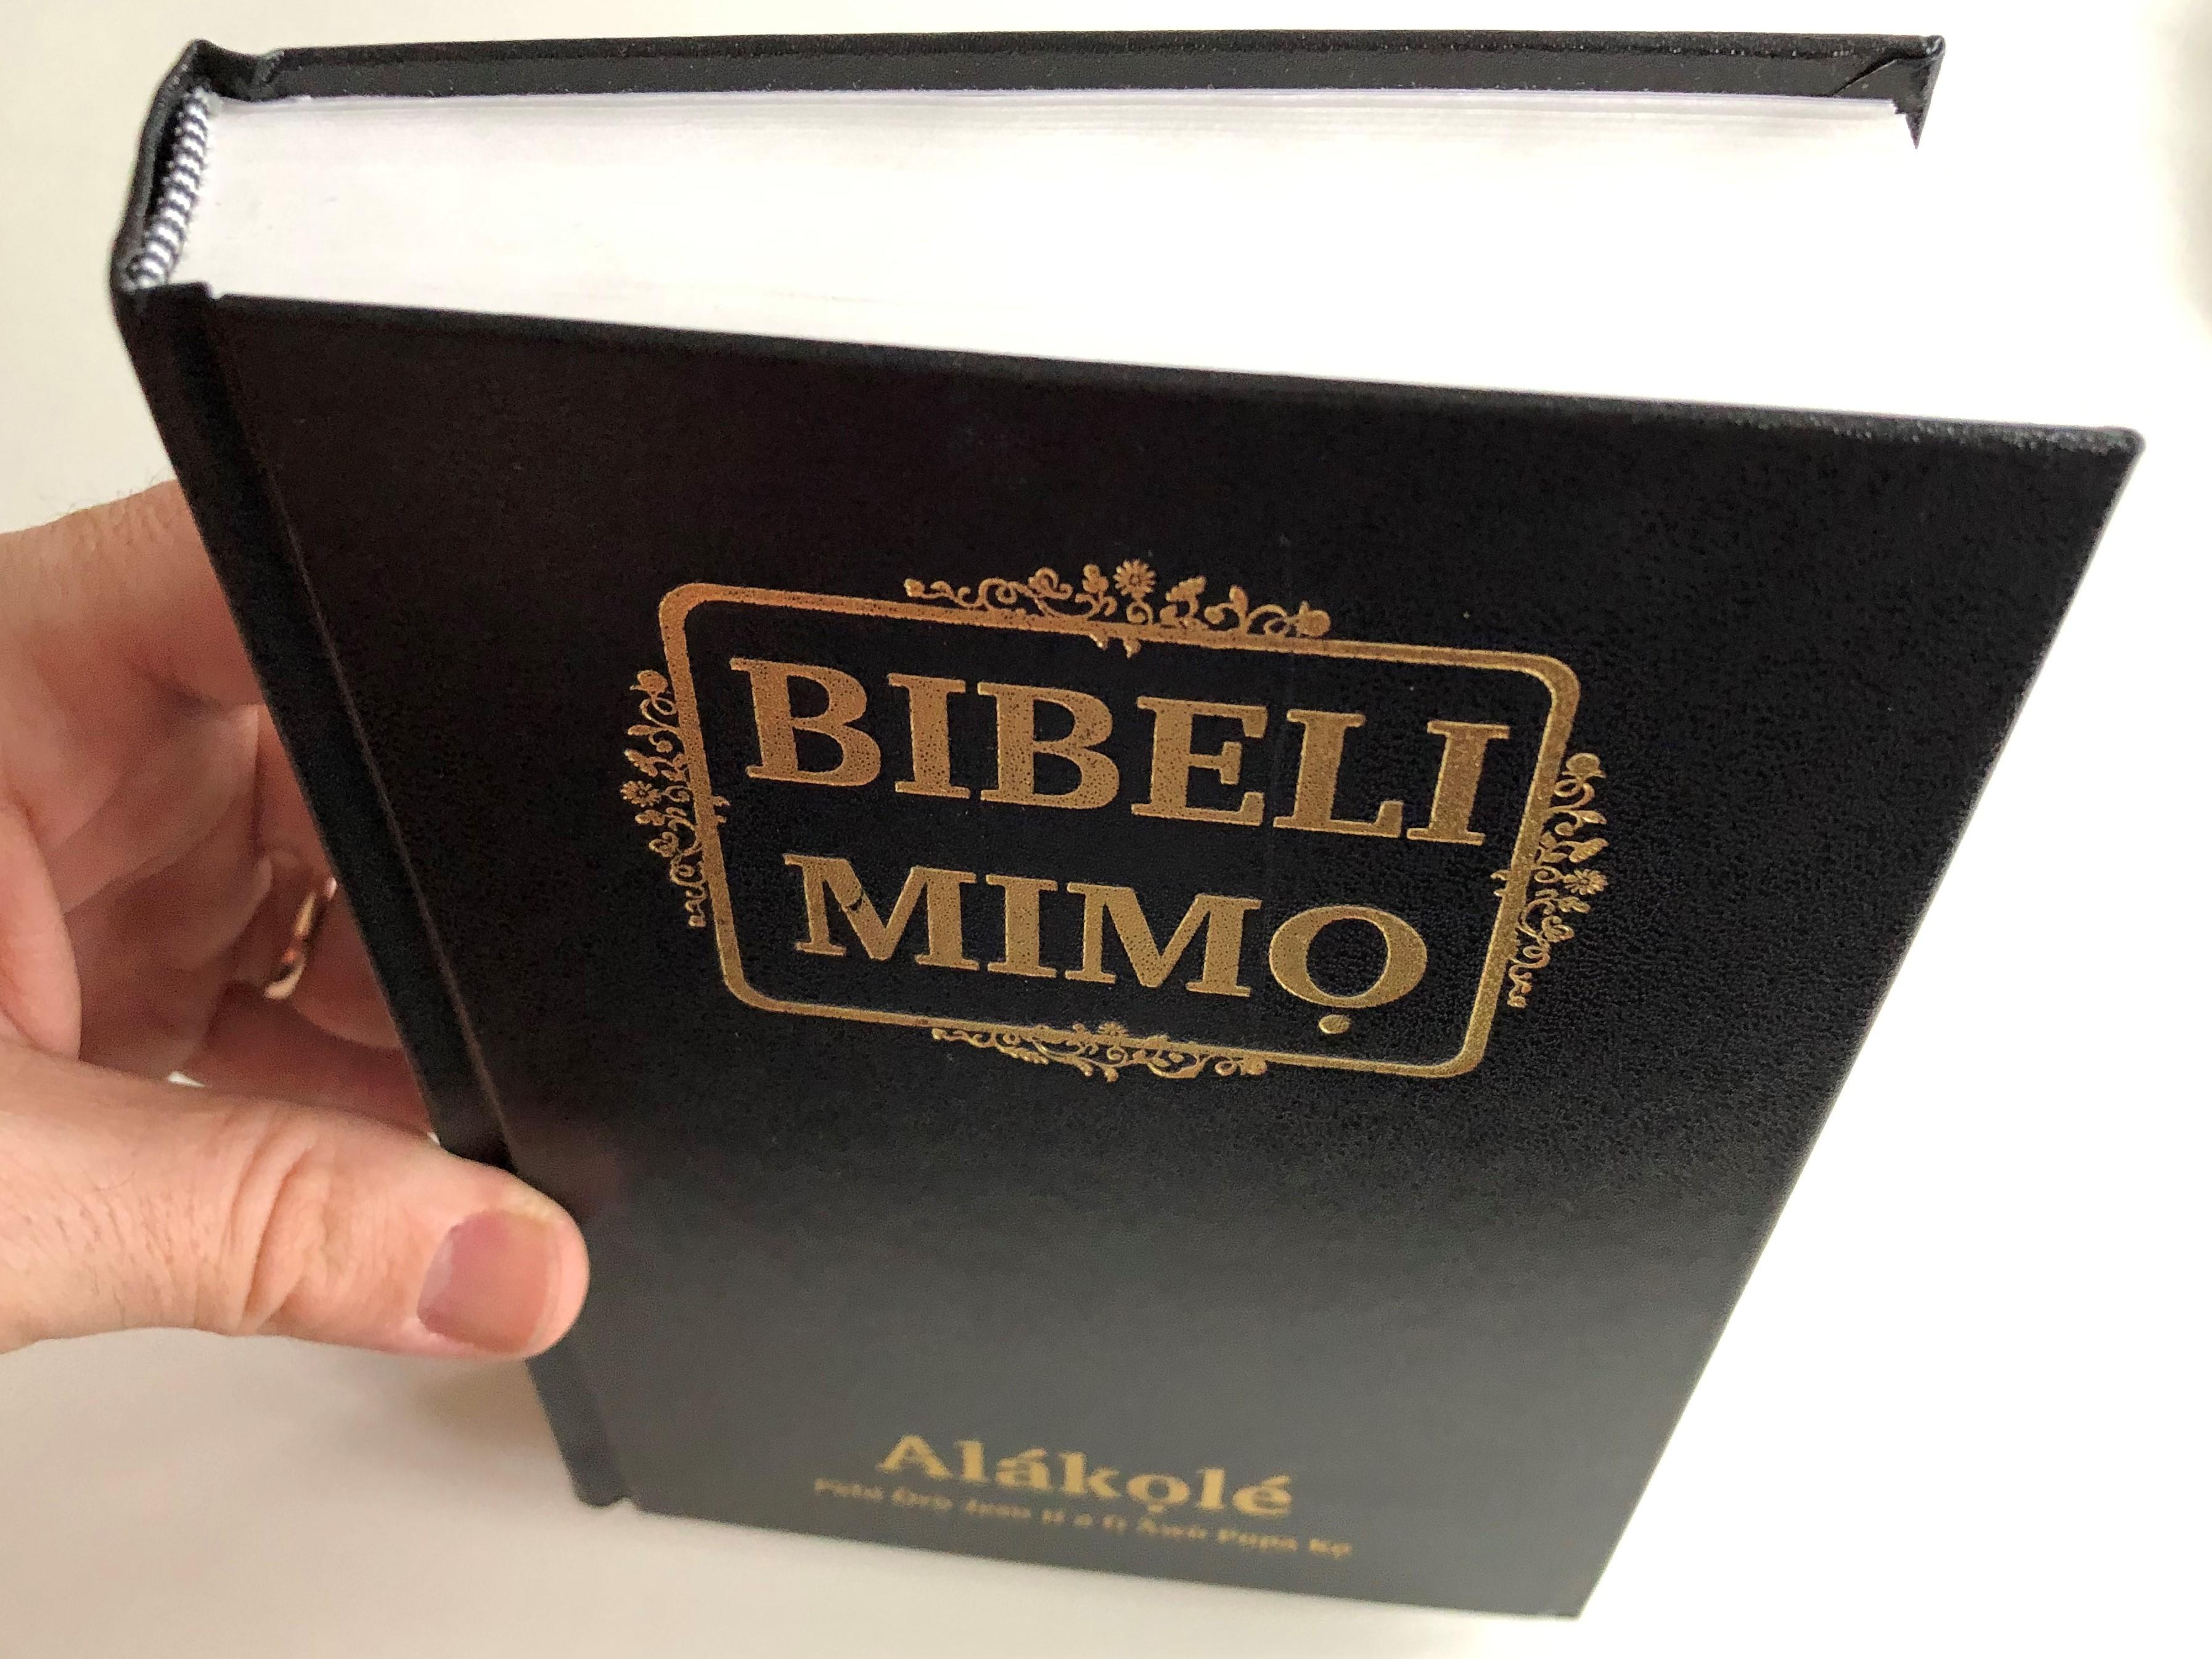 bibeli-mimo-al-kol-yoruba-language-holy-bible-19.jpg